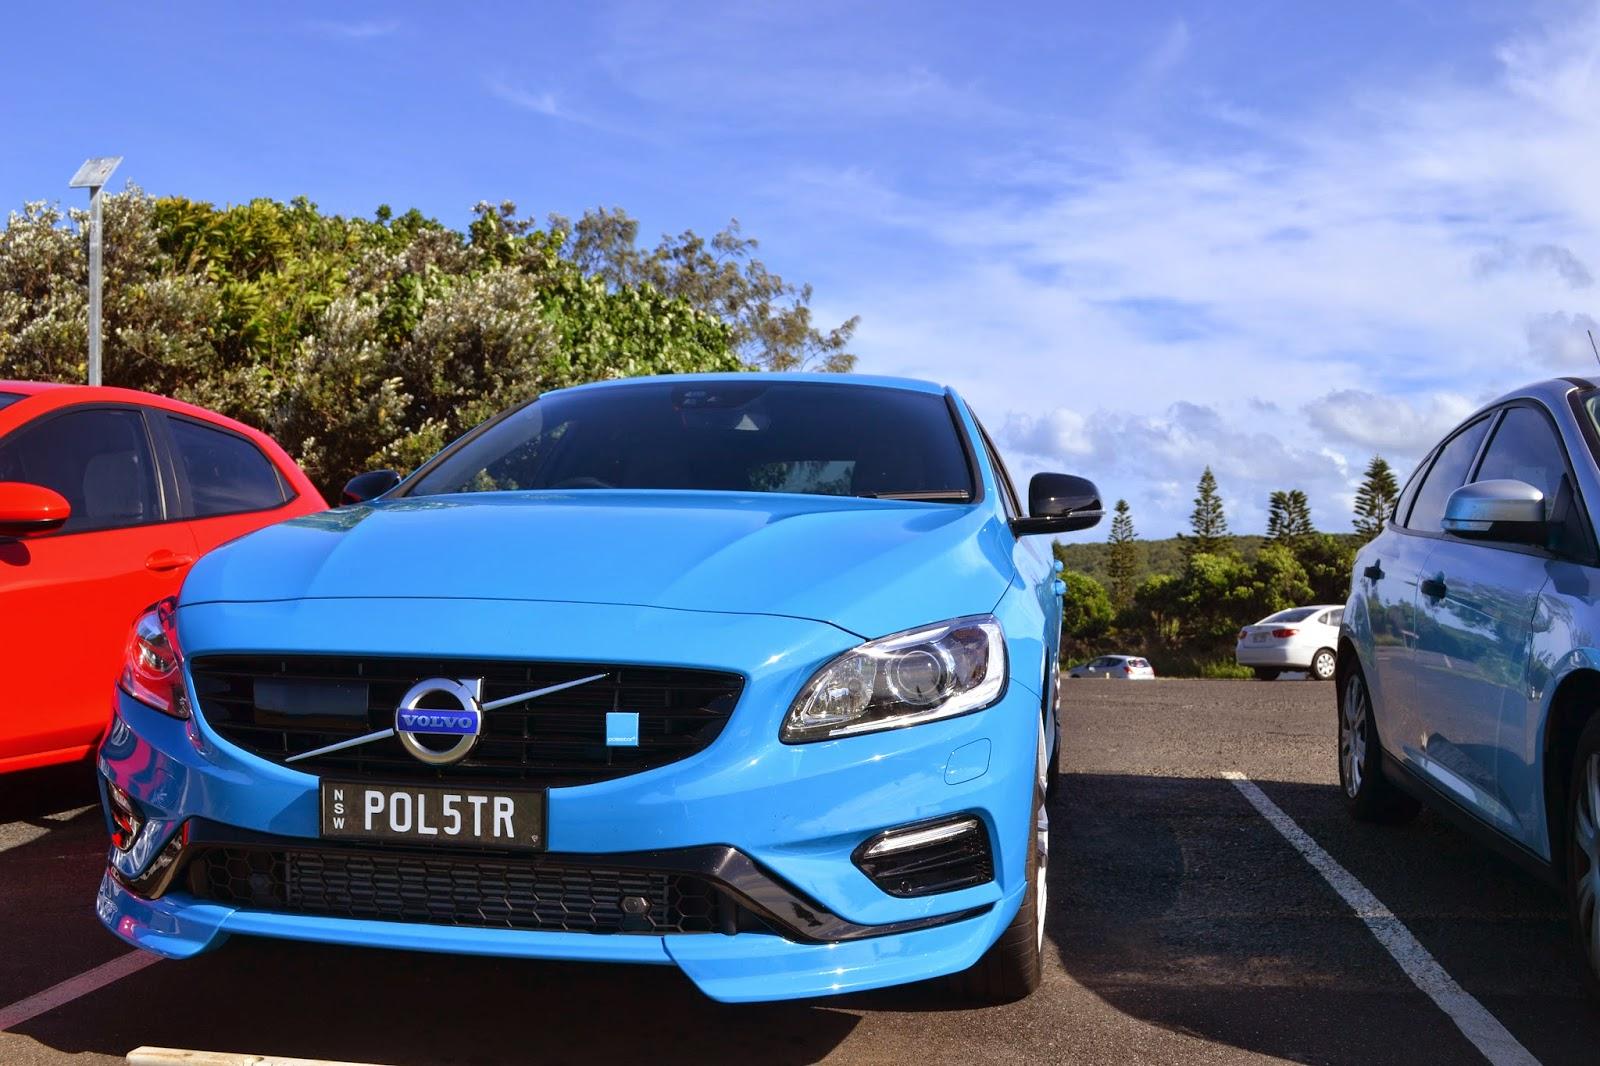 The Volvo V60 Polestar enjoying the Autumn sun in Byron Bay